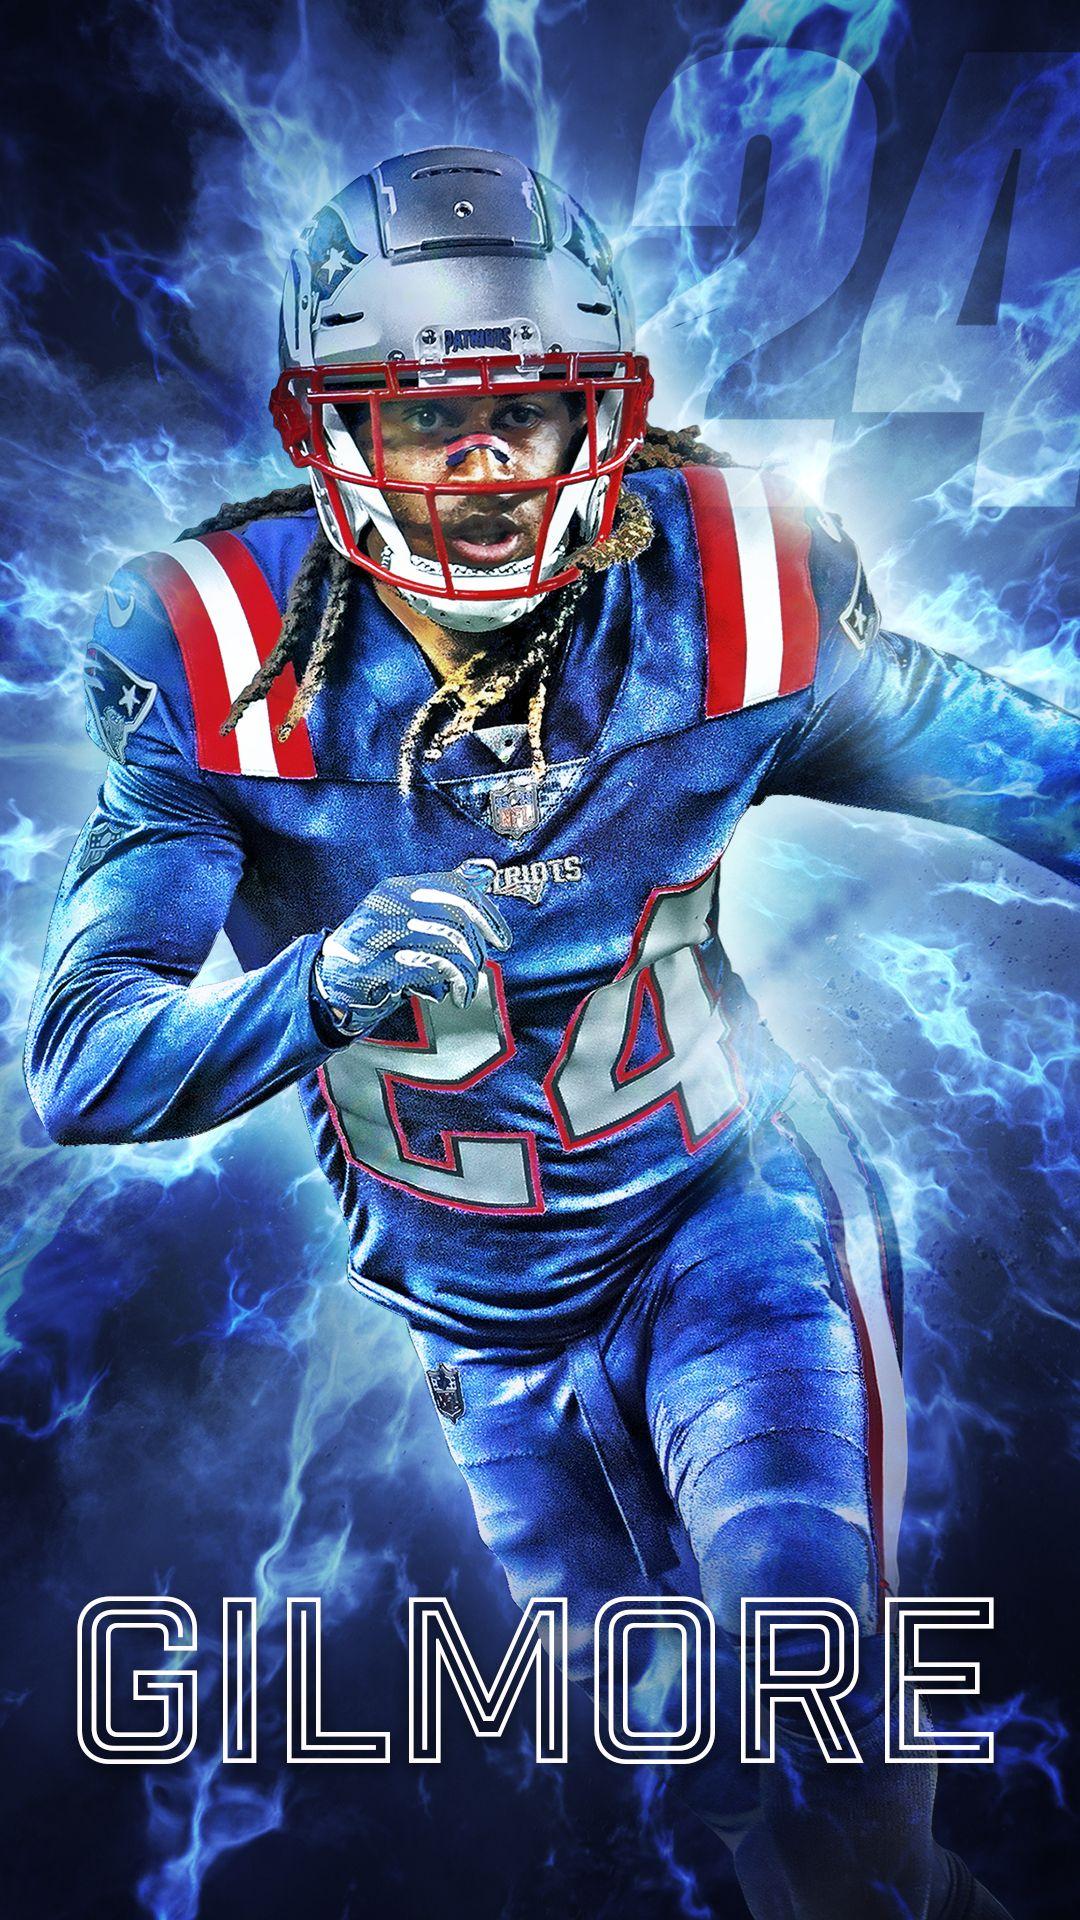 Badass Carolina Panthers Background In 2020 New England Patriots Memes New England Patriots Logo New England Patriots Wallpaper